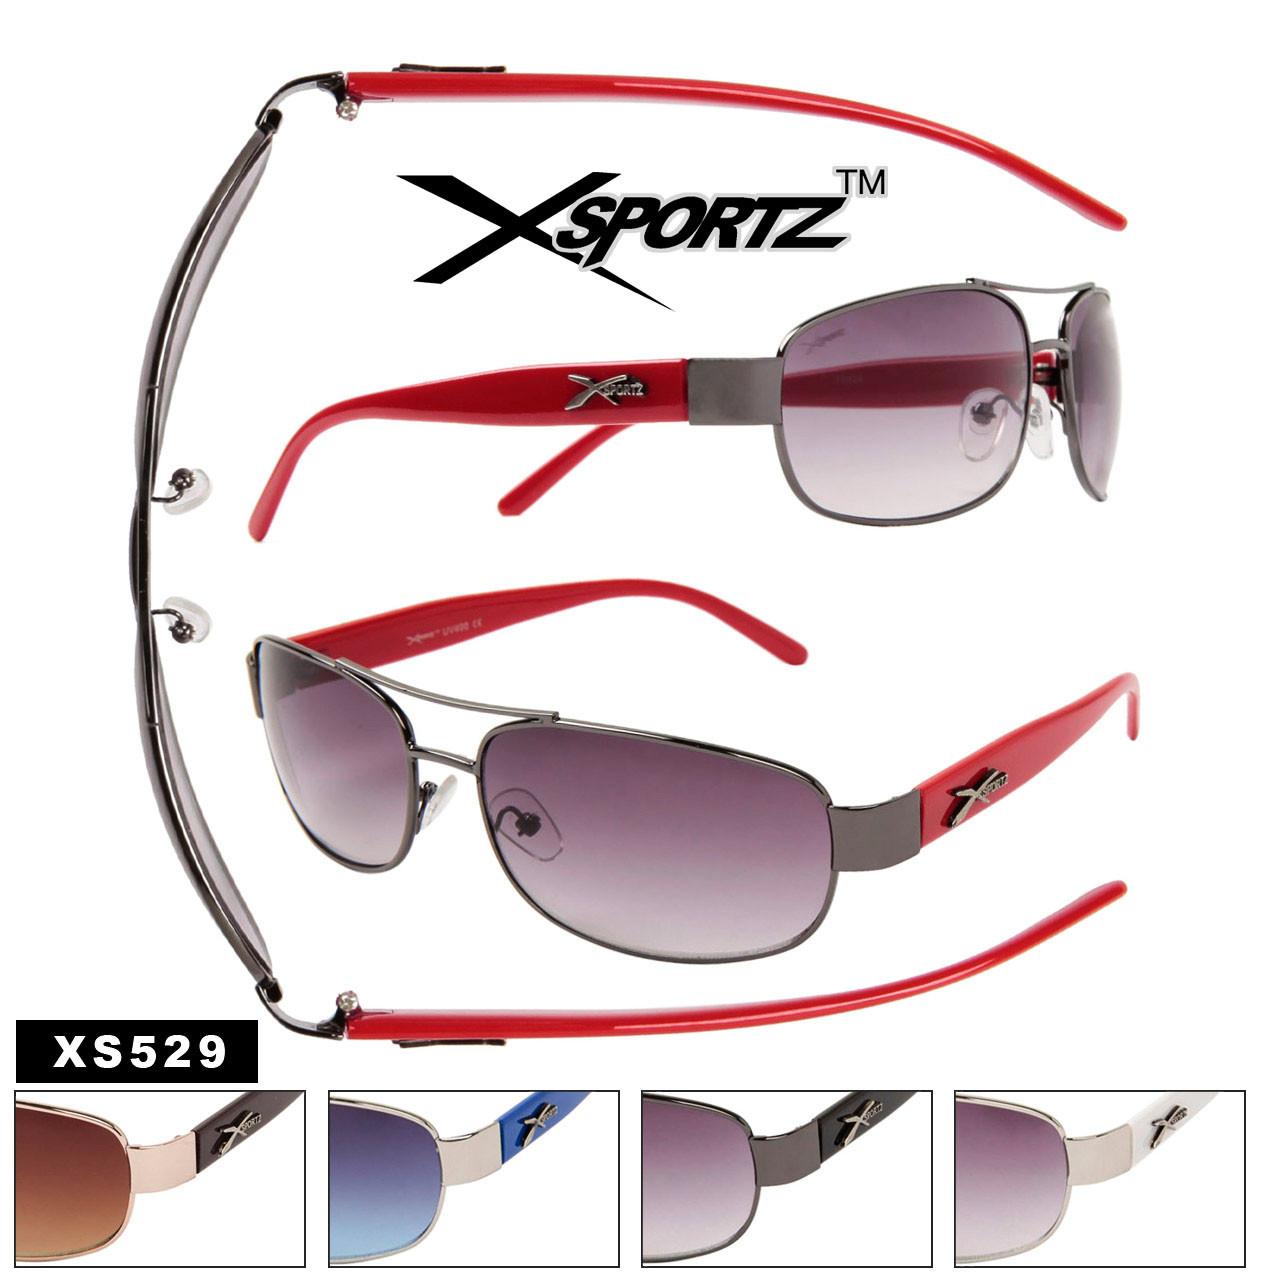 Xsportz Wholesale Sunglasses XS529